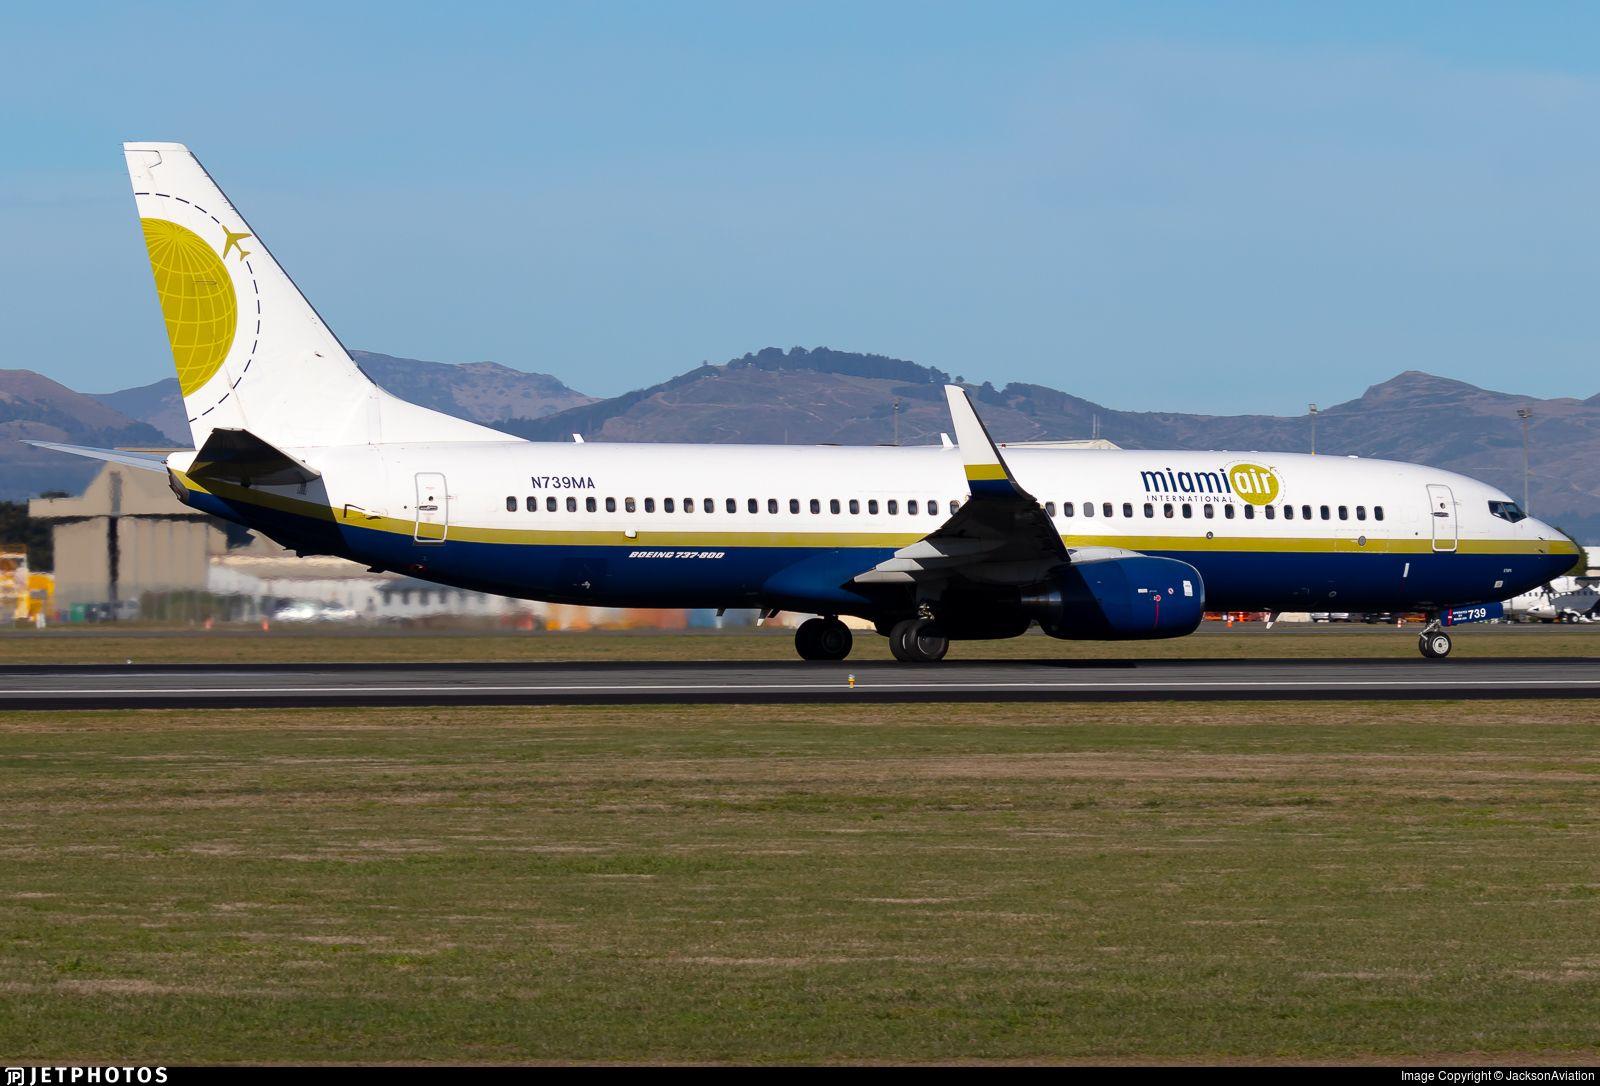 N739MA Christchurch international airport, Boeing 737